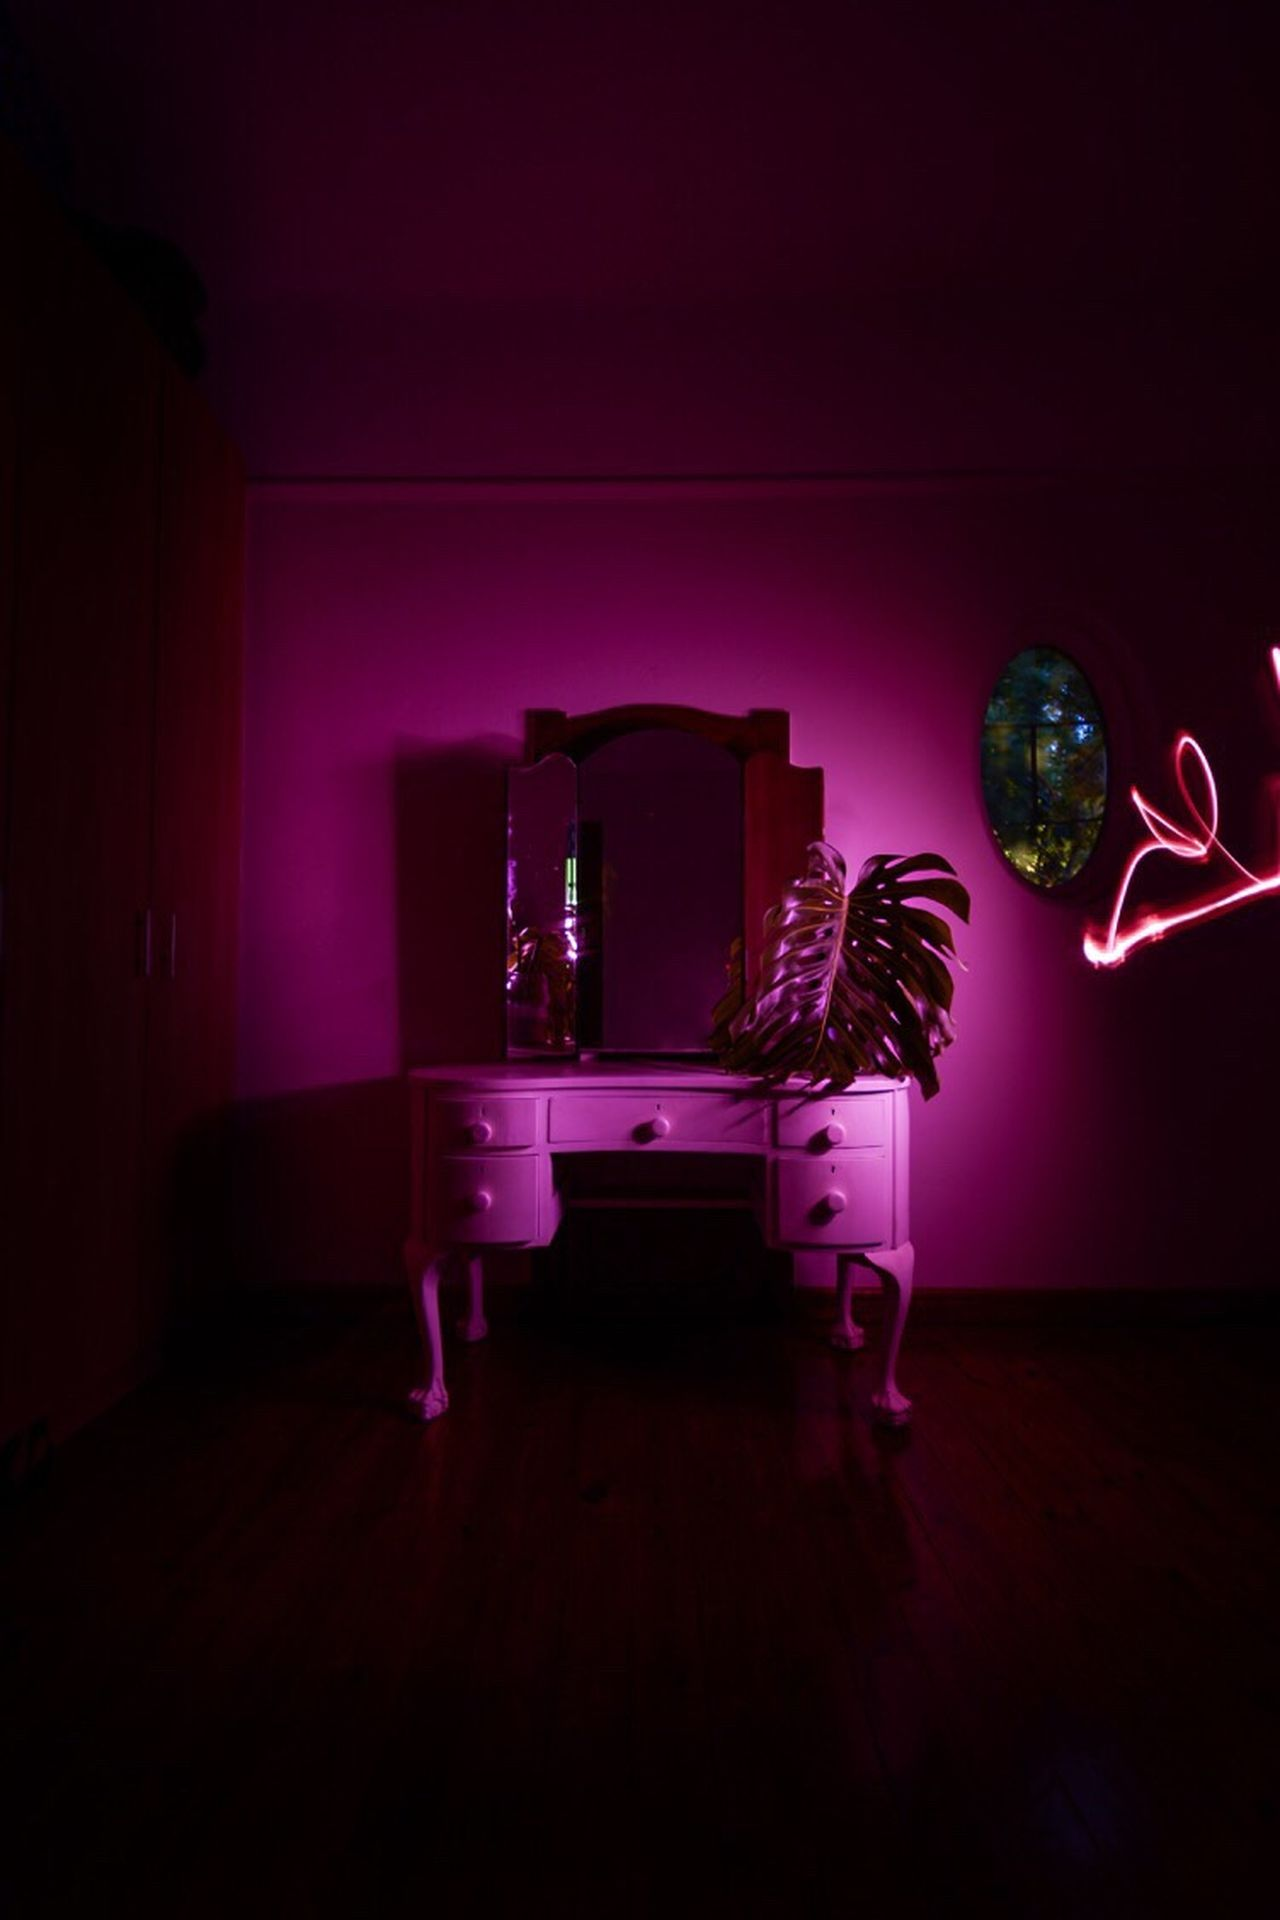 Deliciousmonster Plant Neon Lifestyle Pink Dressingtable Lightpainting